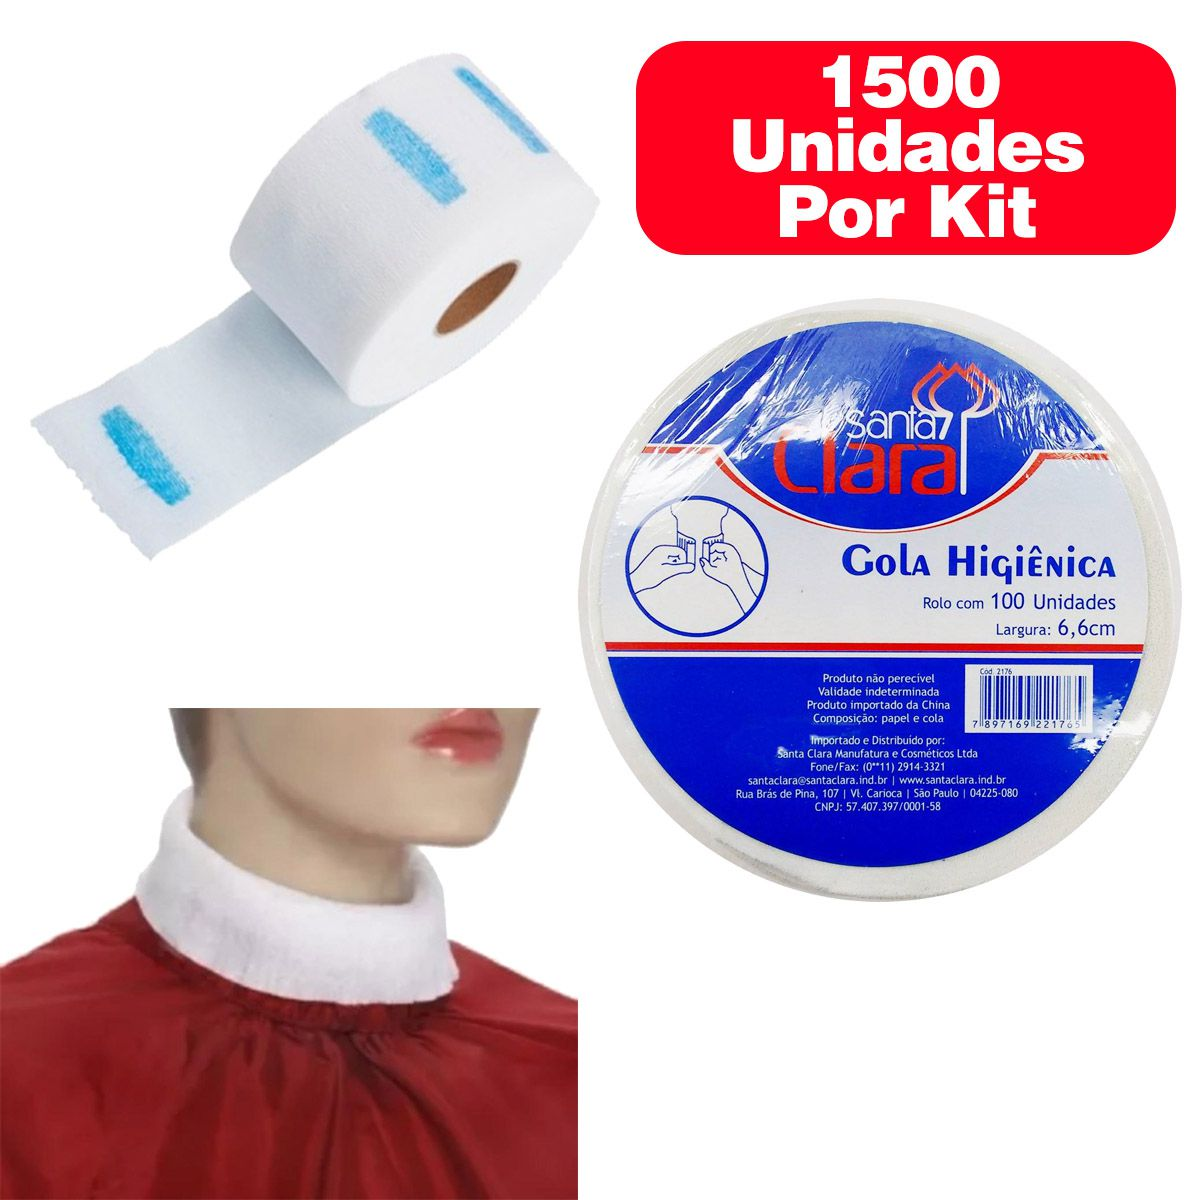 Gola Higienica 15 Rolos C/100 Unidades - 1500 unidades